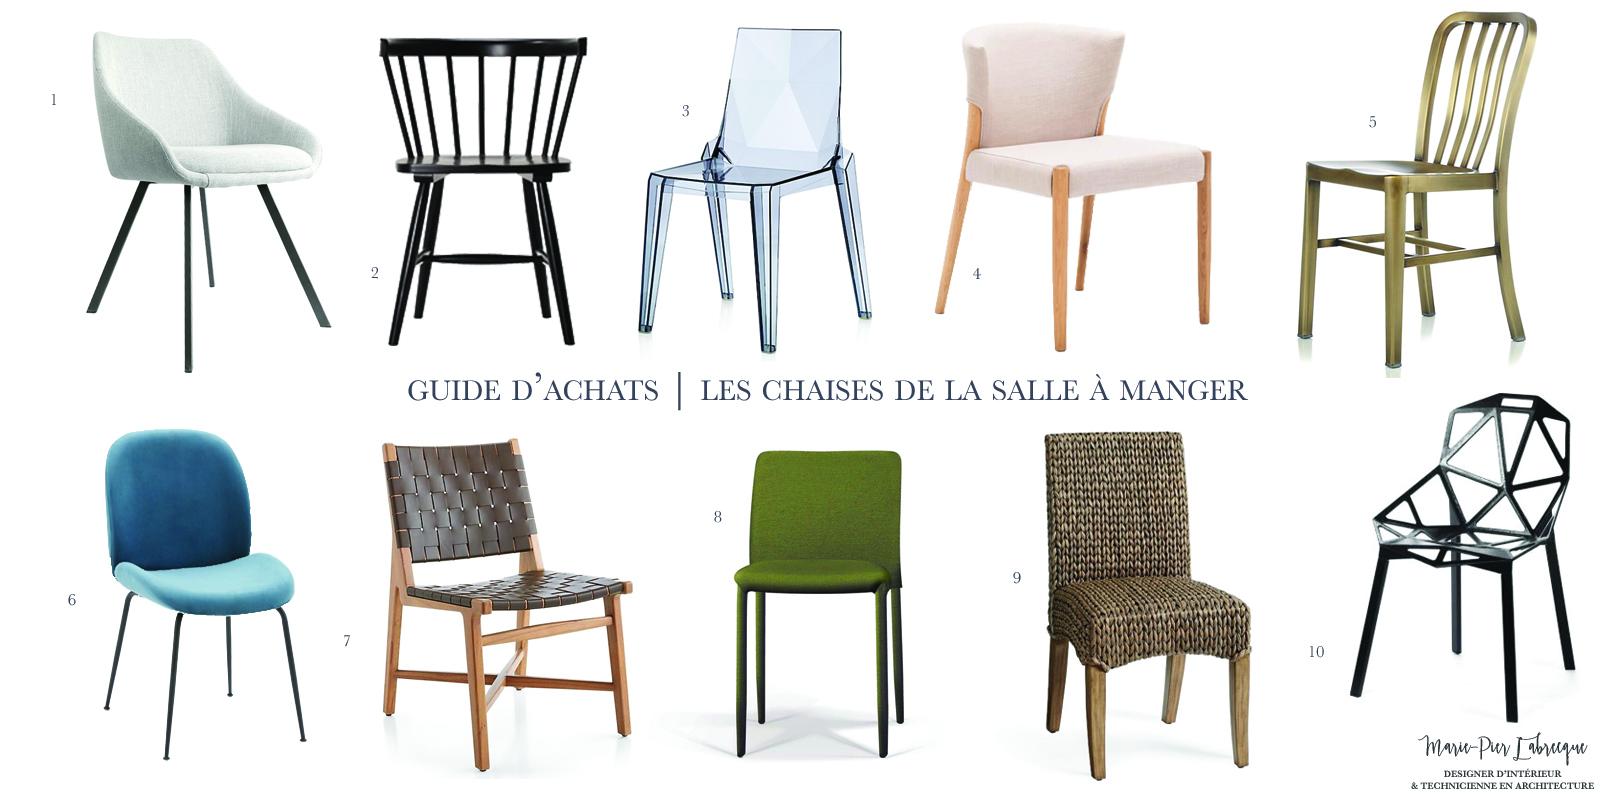 Guide d'achats les chaises.jpg